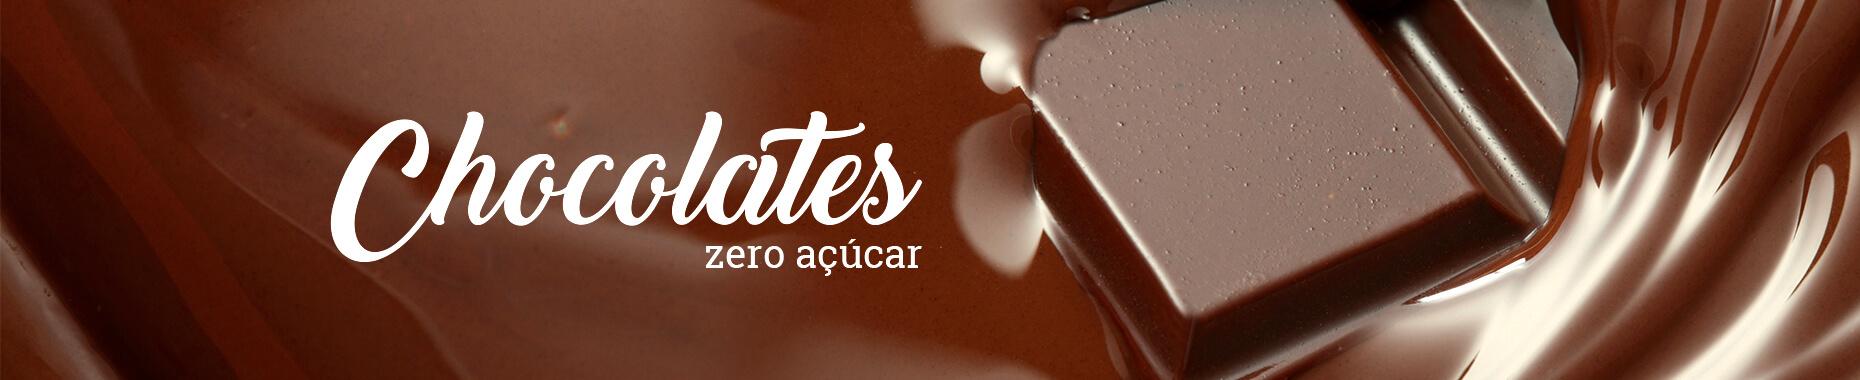 chocolates zero açúcar